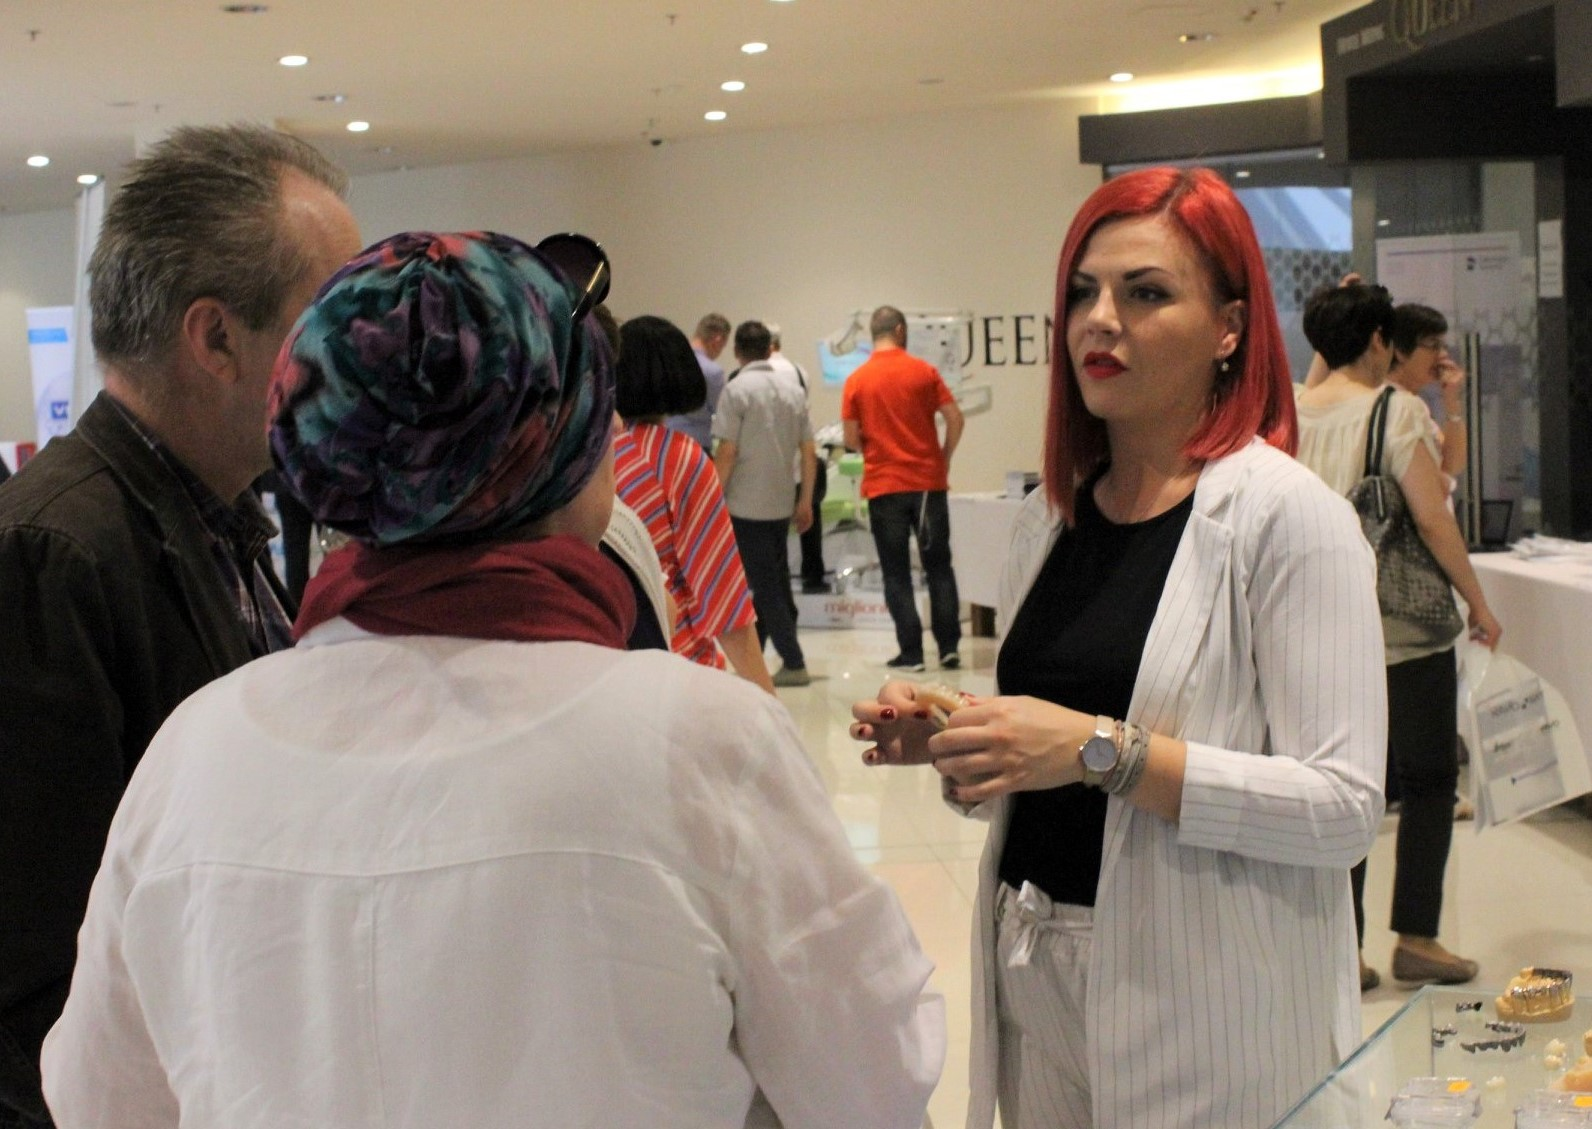 Simpozijumu sa međunarodnim učešćem u Mostaru